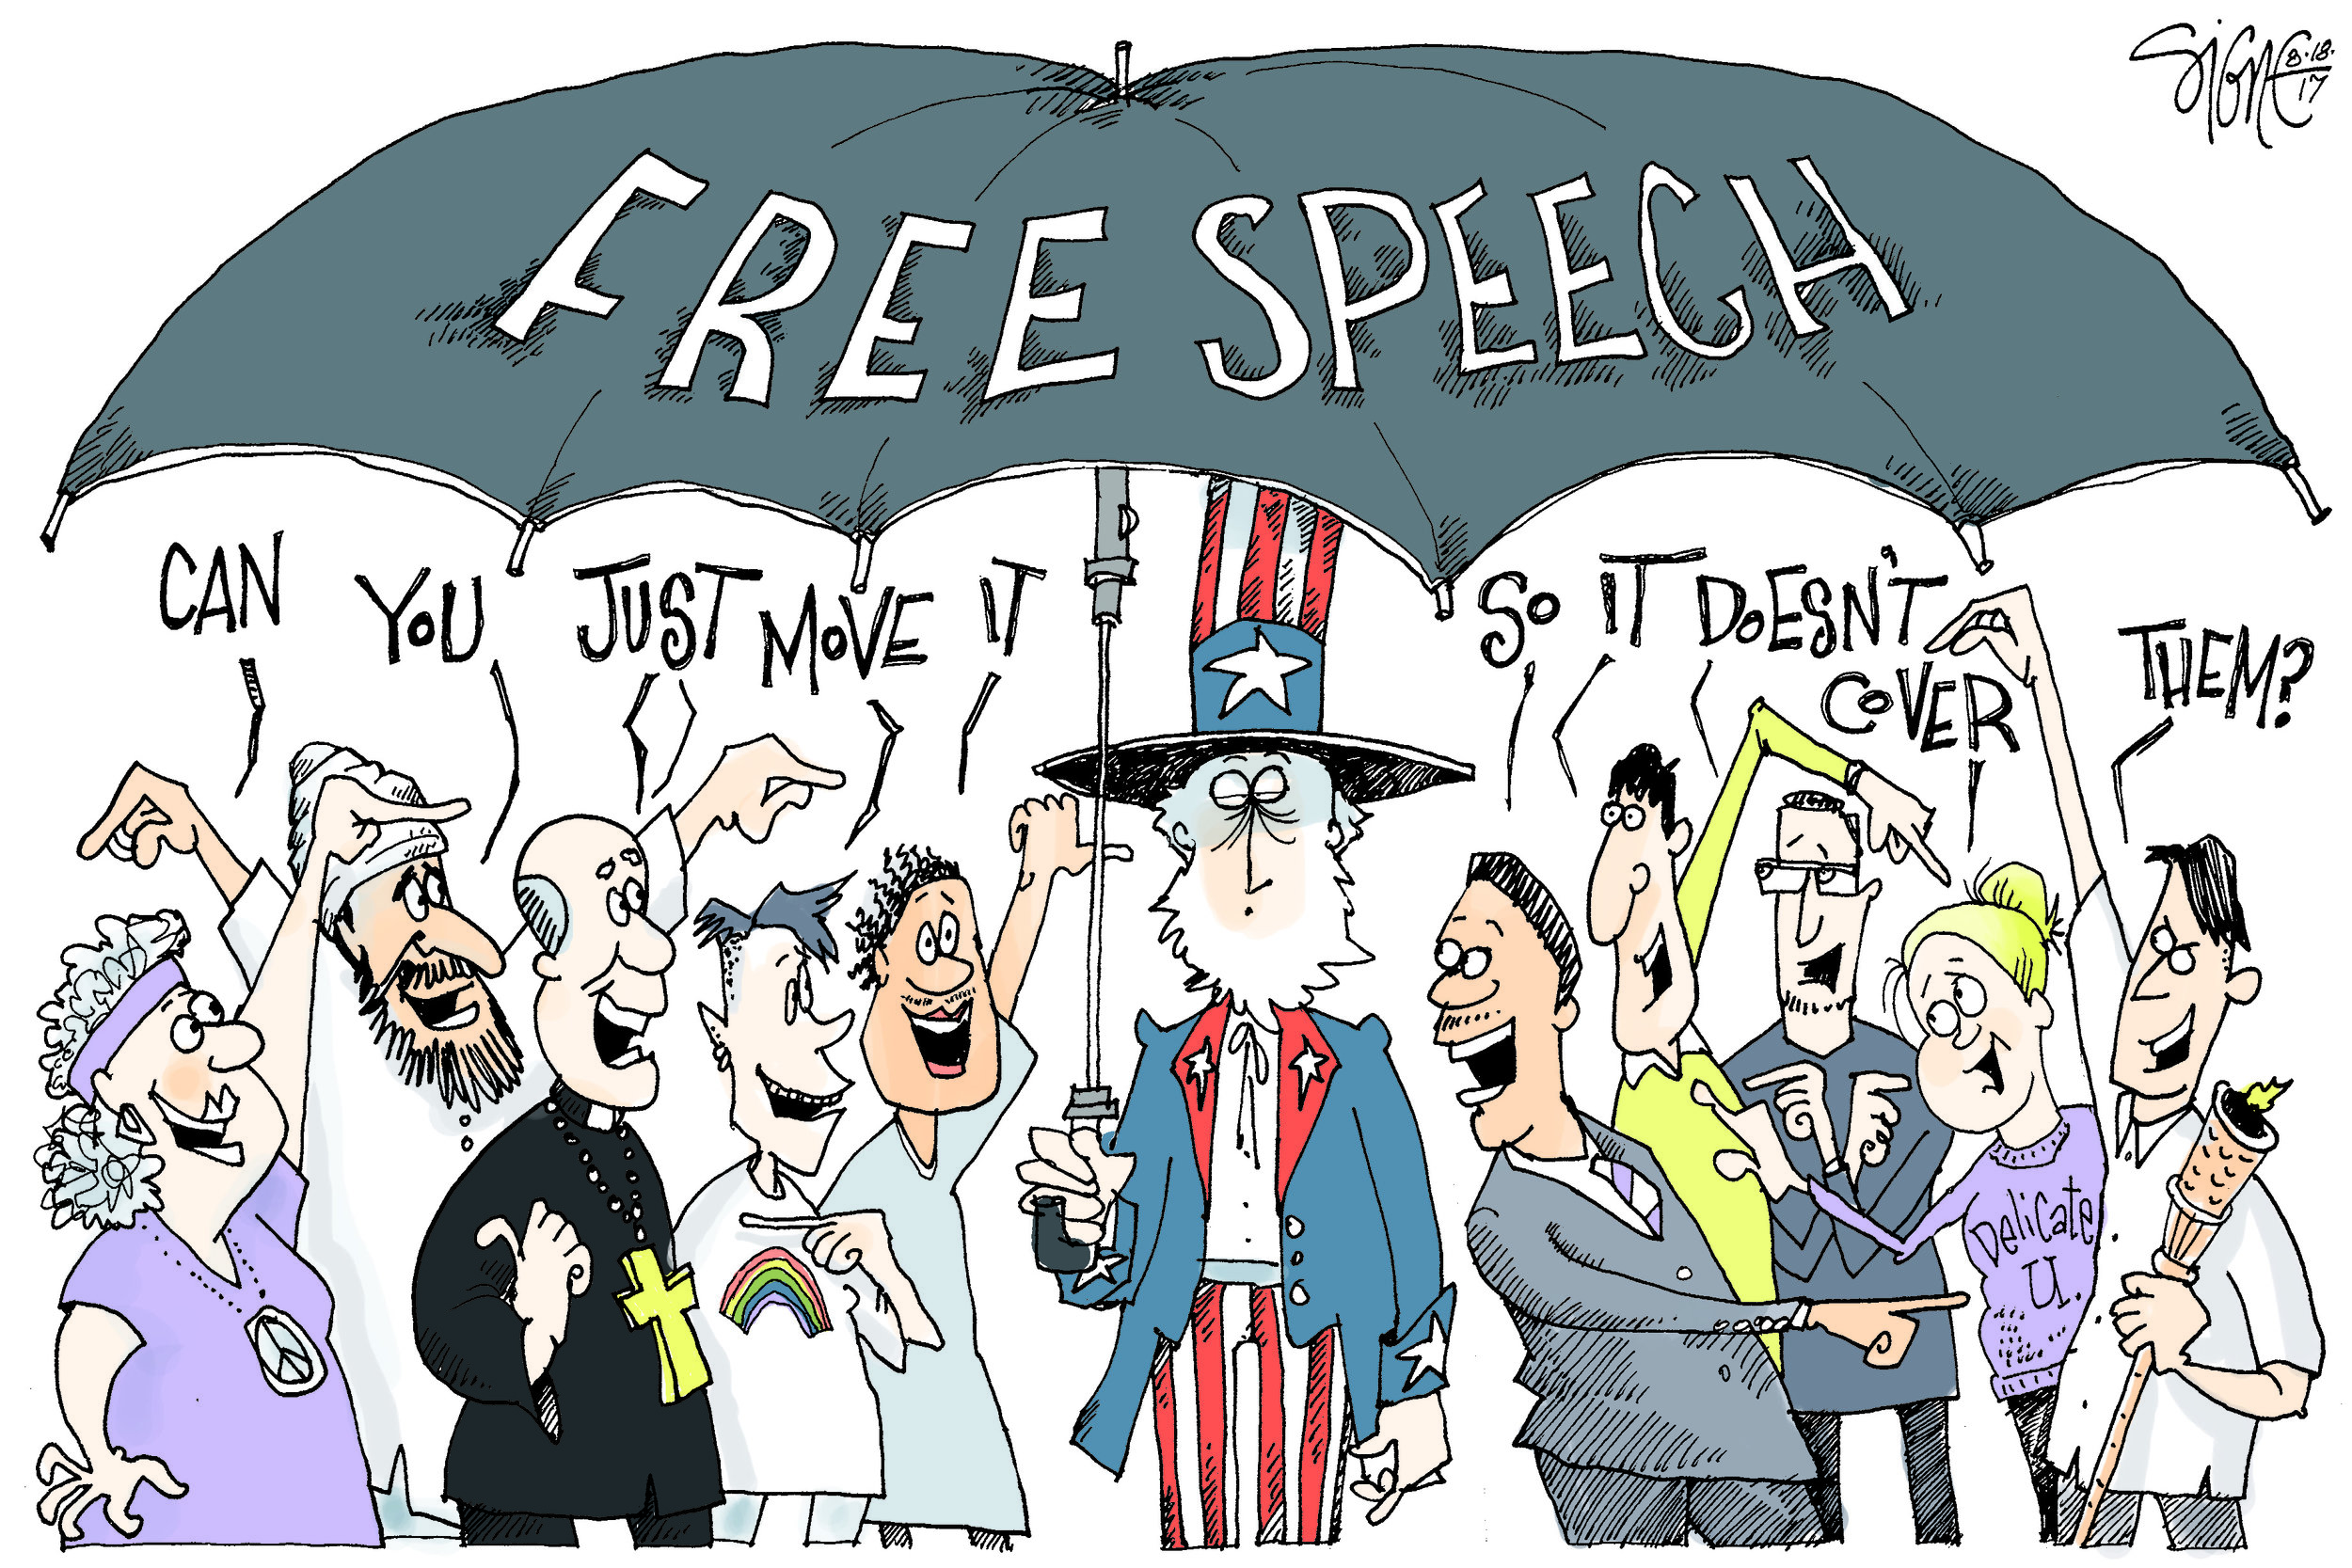 08-18-17 Free SpeechC.jpg